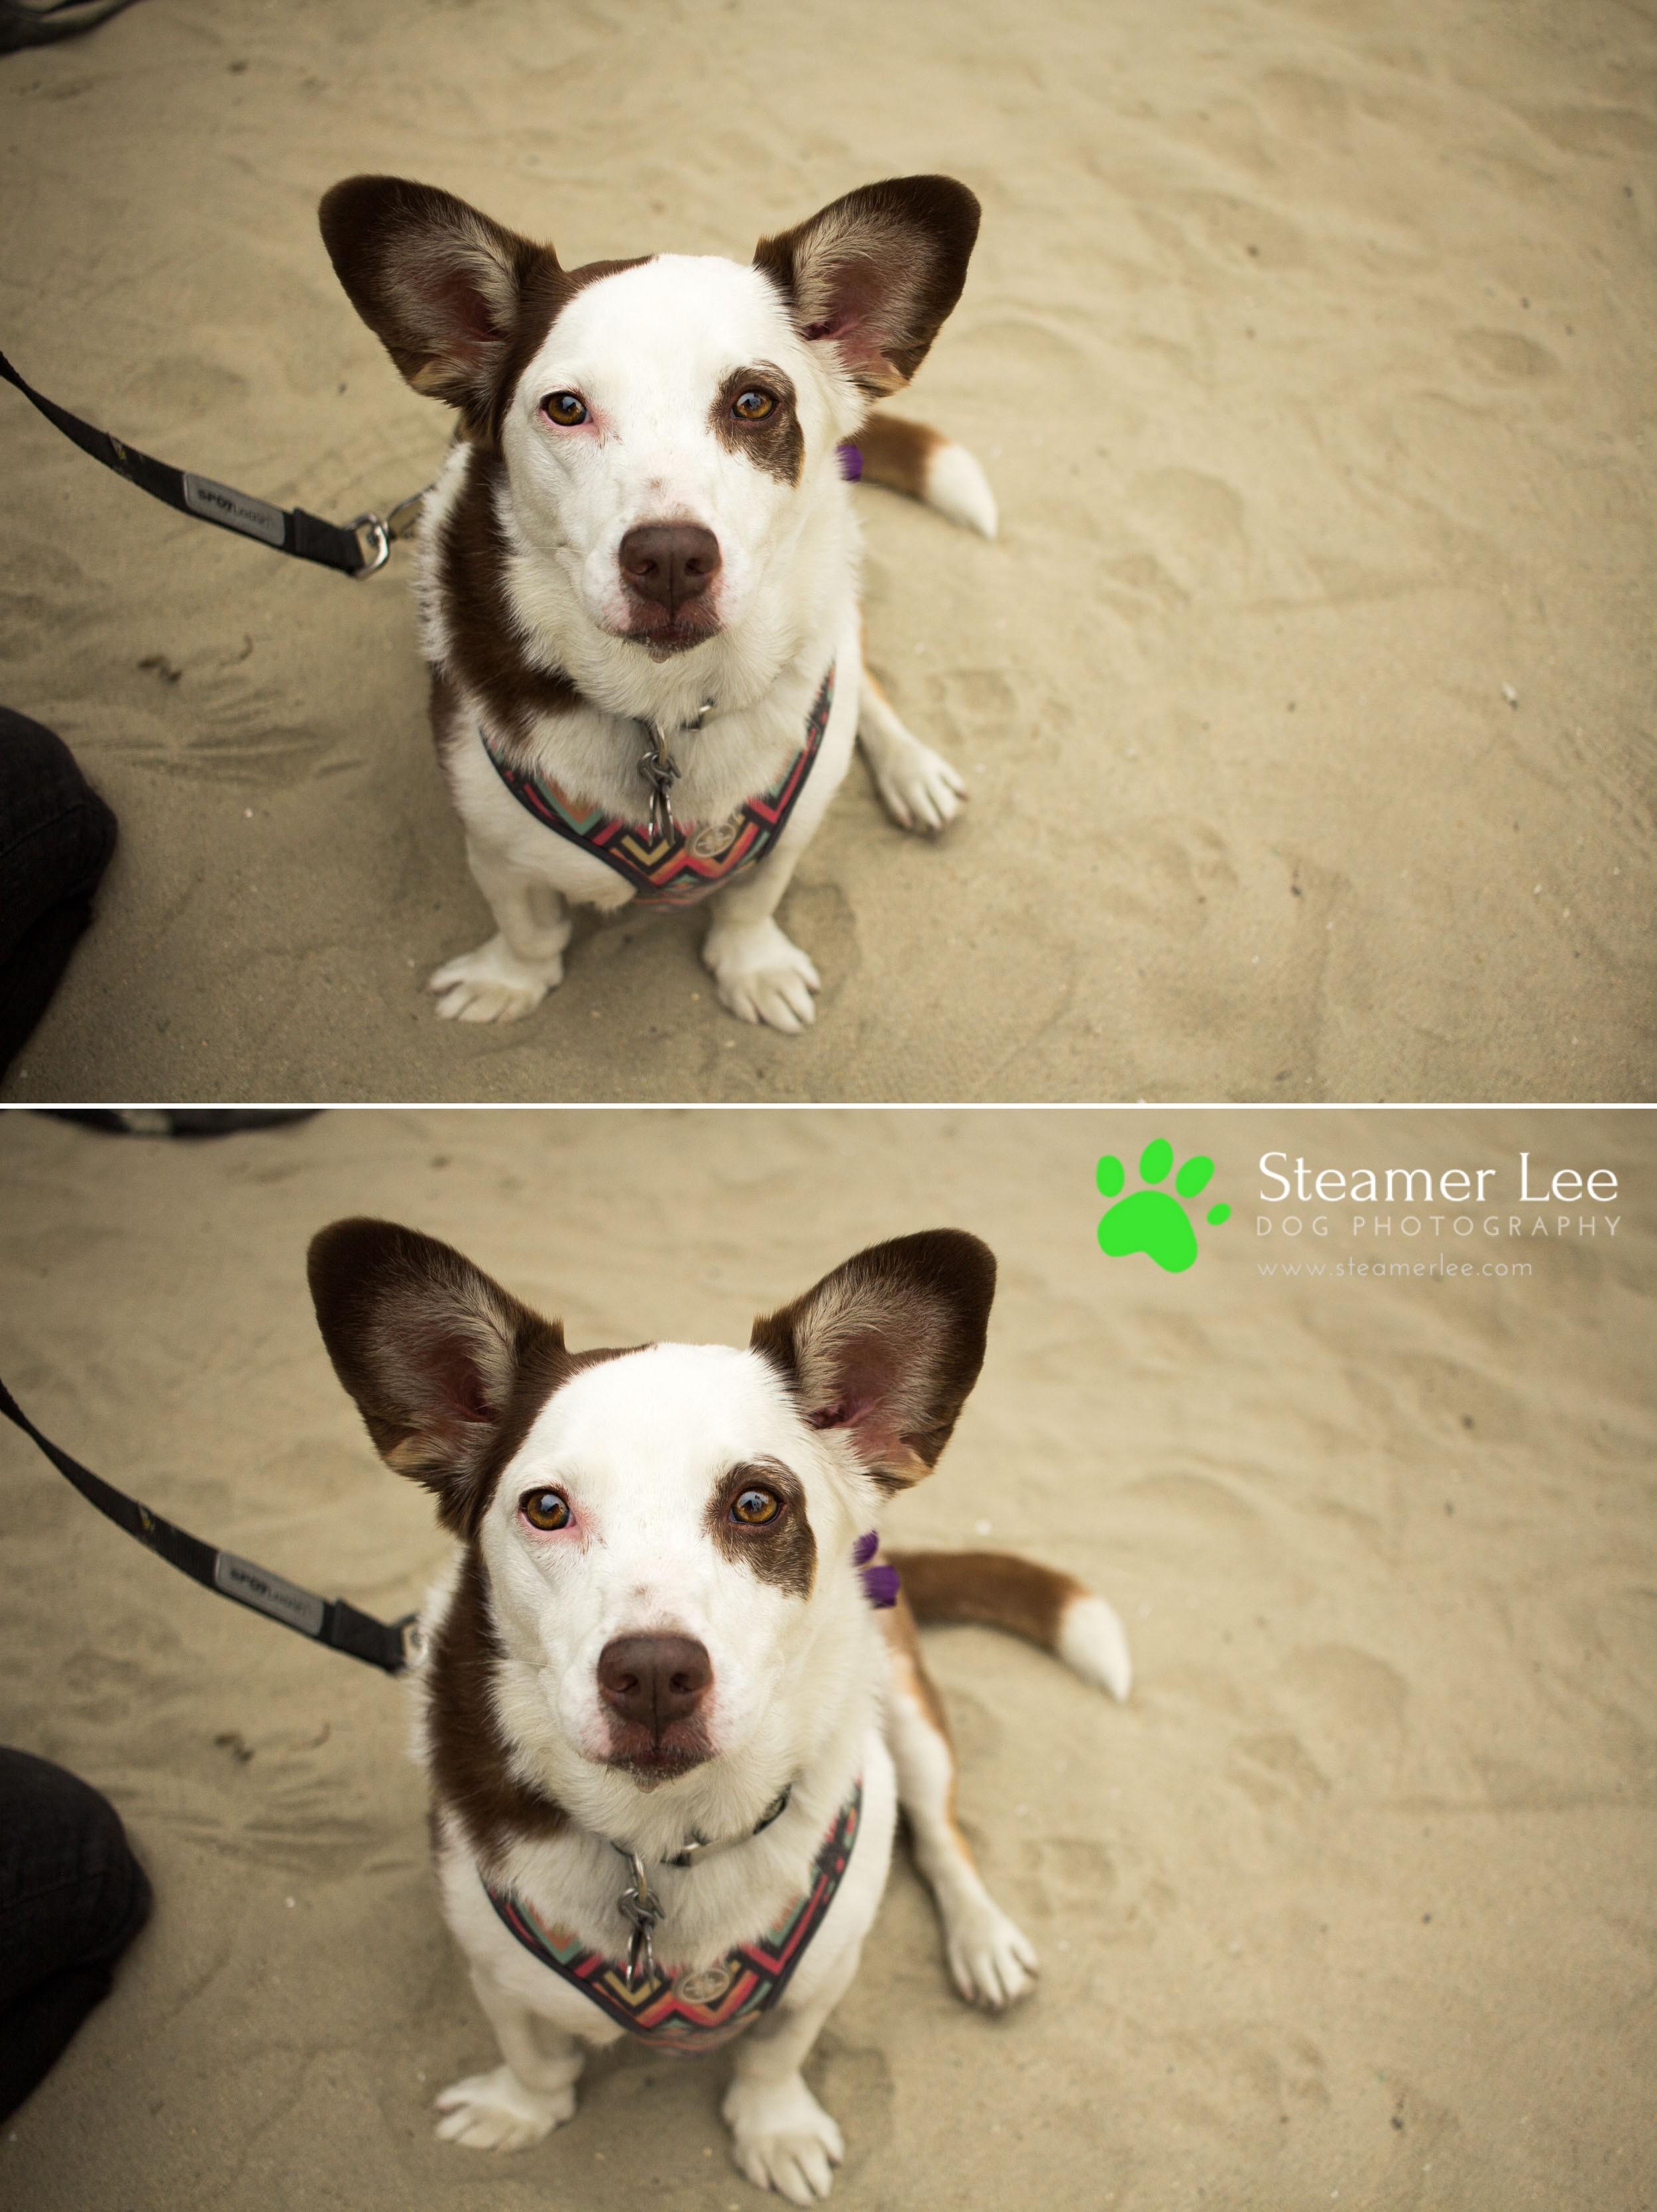 Steamer Lee Dog Photography - July 2017 So Cal Corgi Beach Day - Vol.2 - 14.jpg